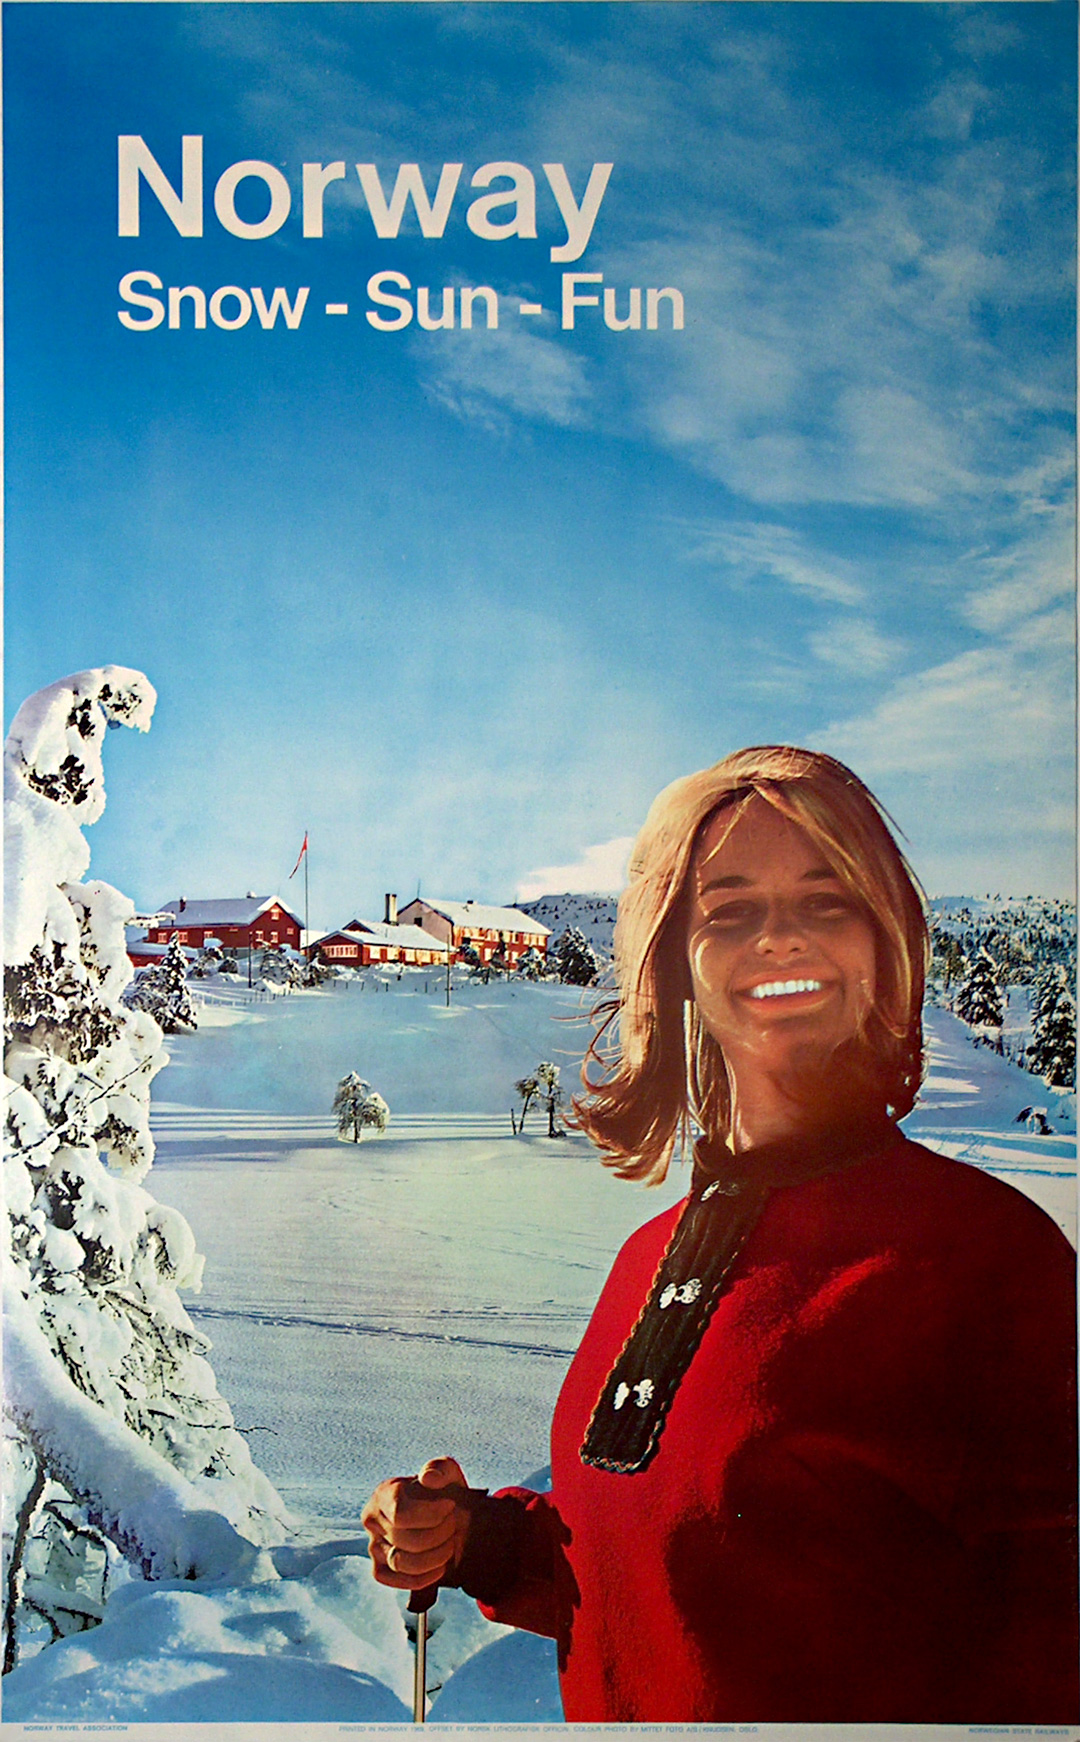 Original Vintage Poster Norway 1969 Snow Sun Fun For Sale At Posterteam Com